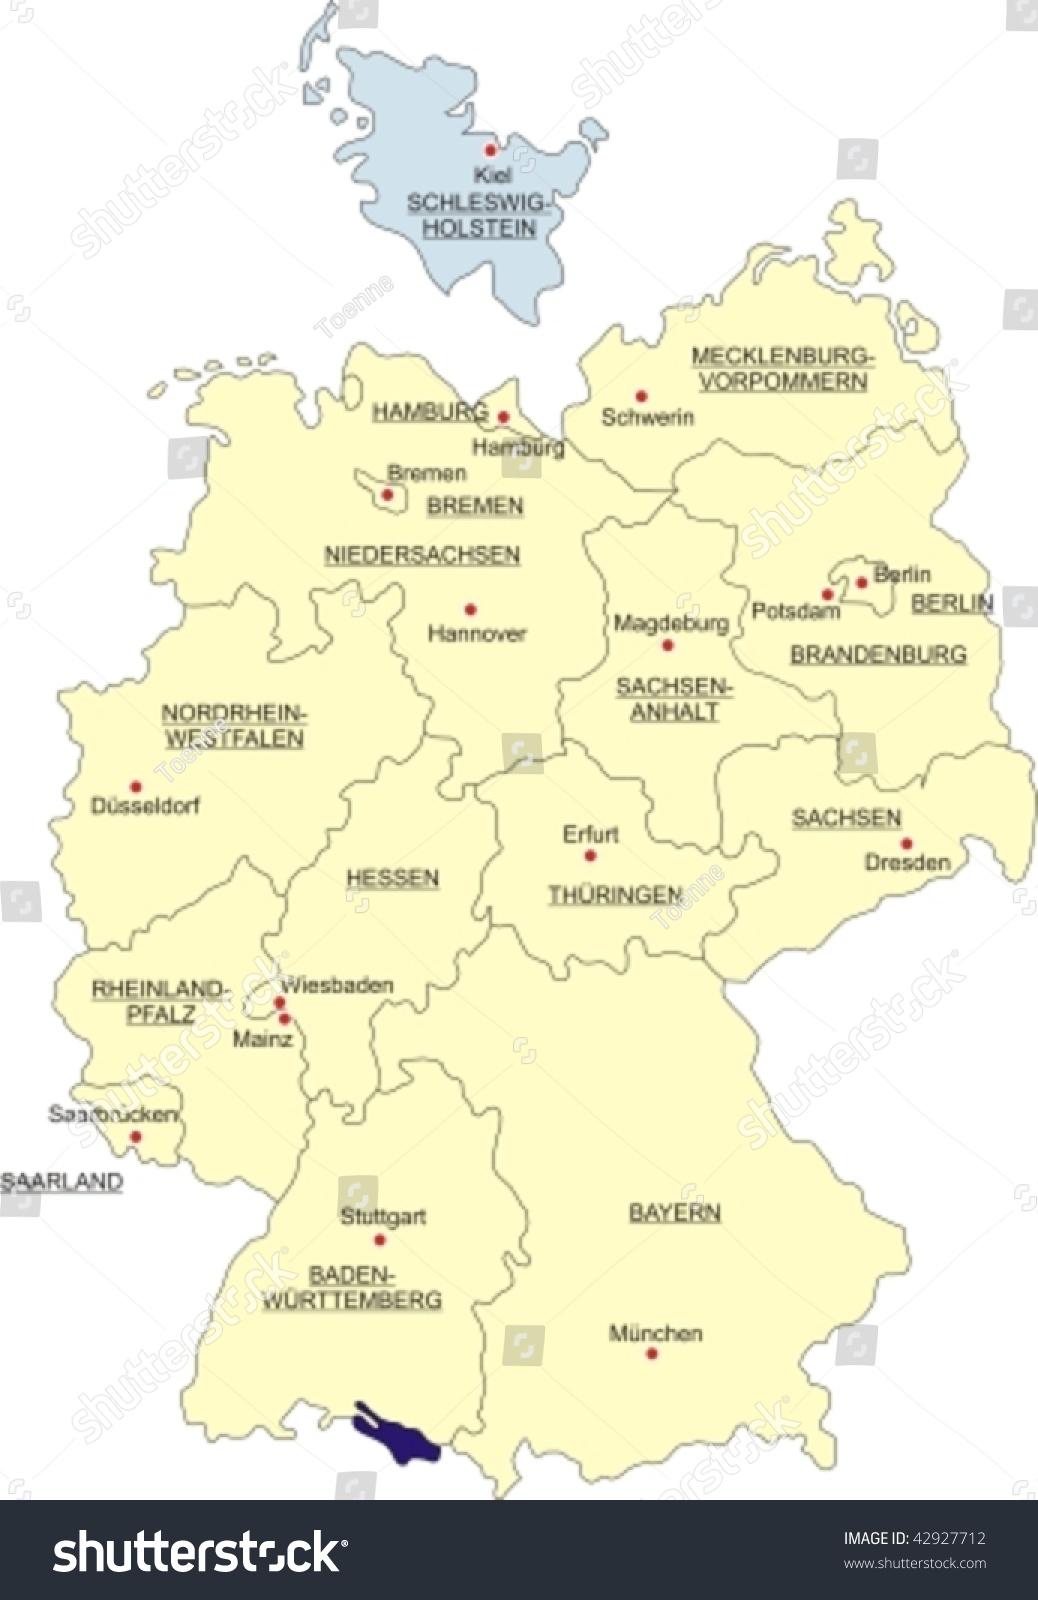 Memphis Tn Zip Code Map Yellowstone Map Pdf - Germany map quiz